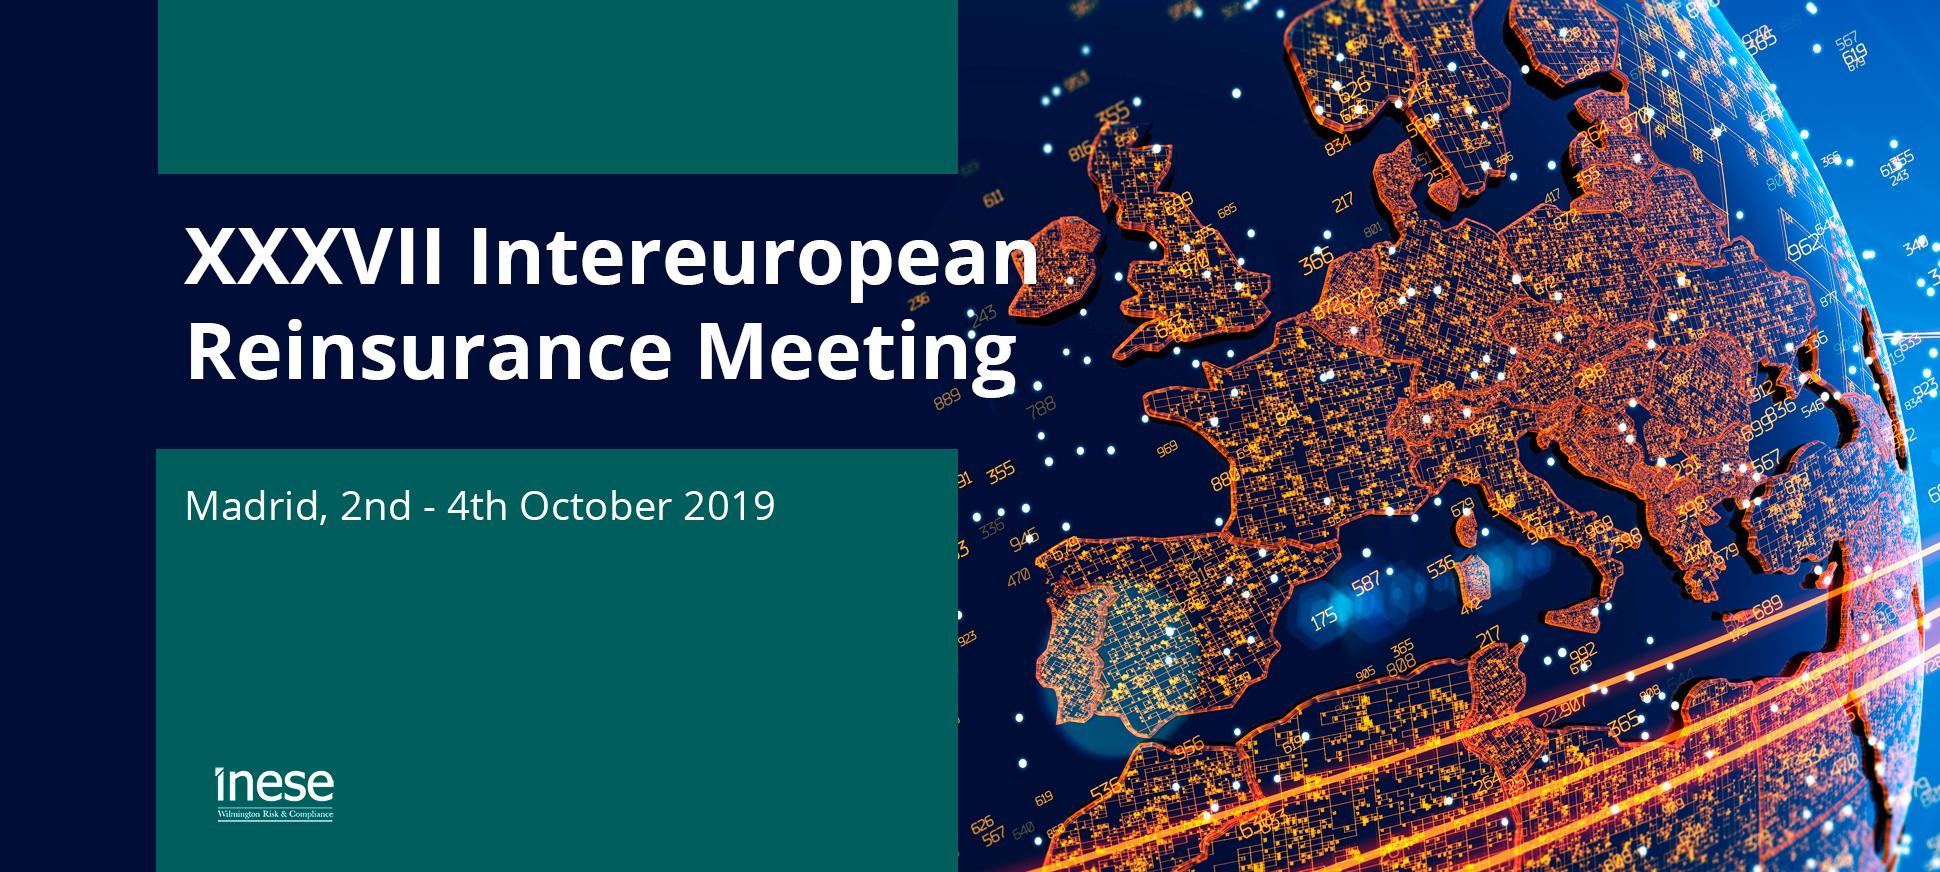 Intereuropean Reinsurance Meeting